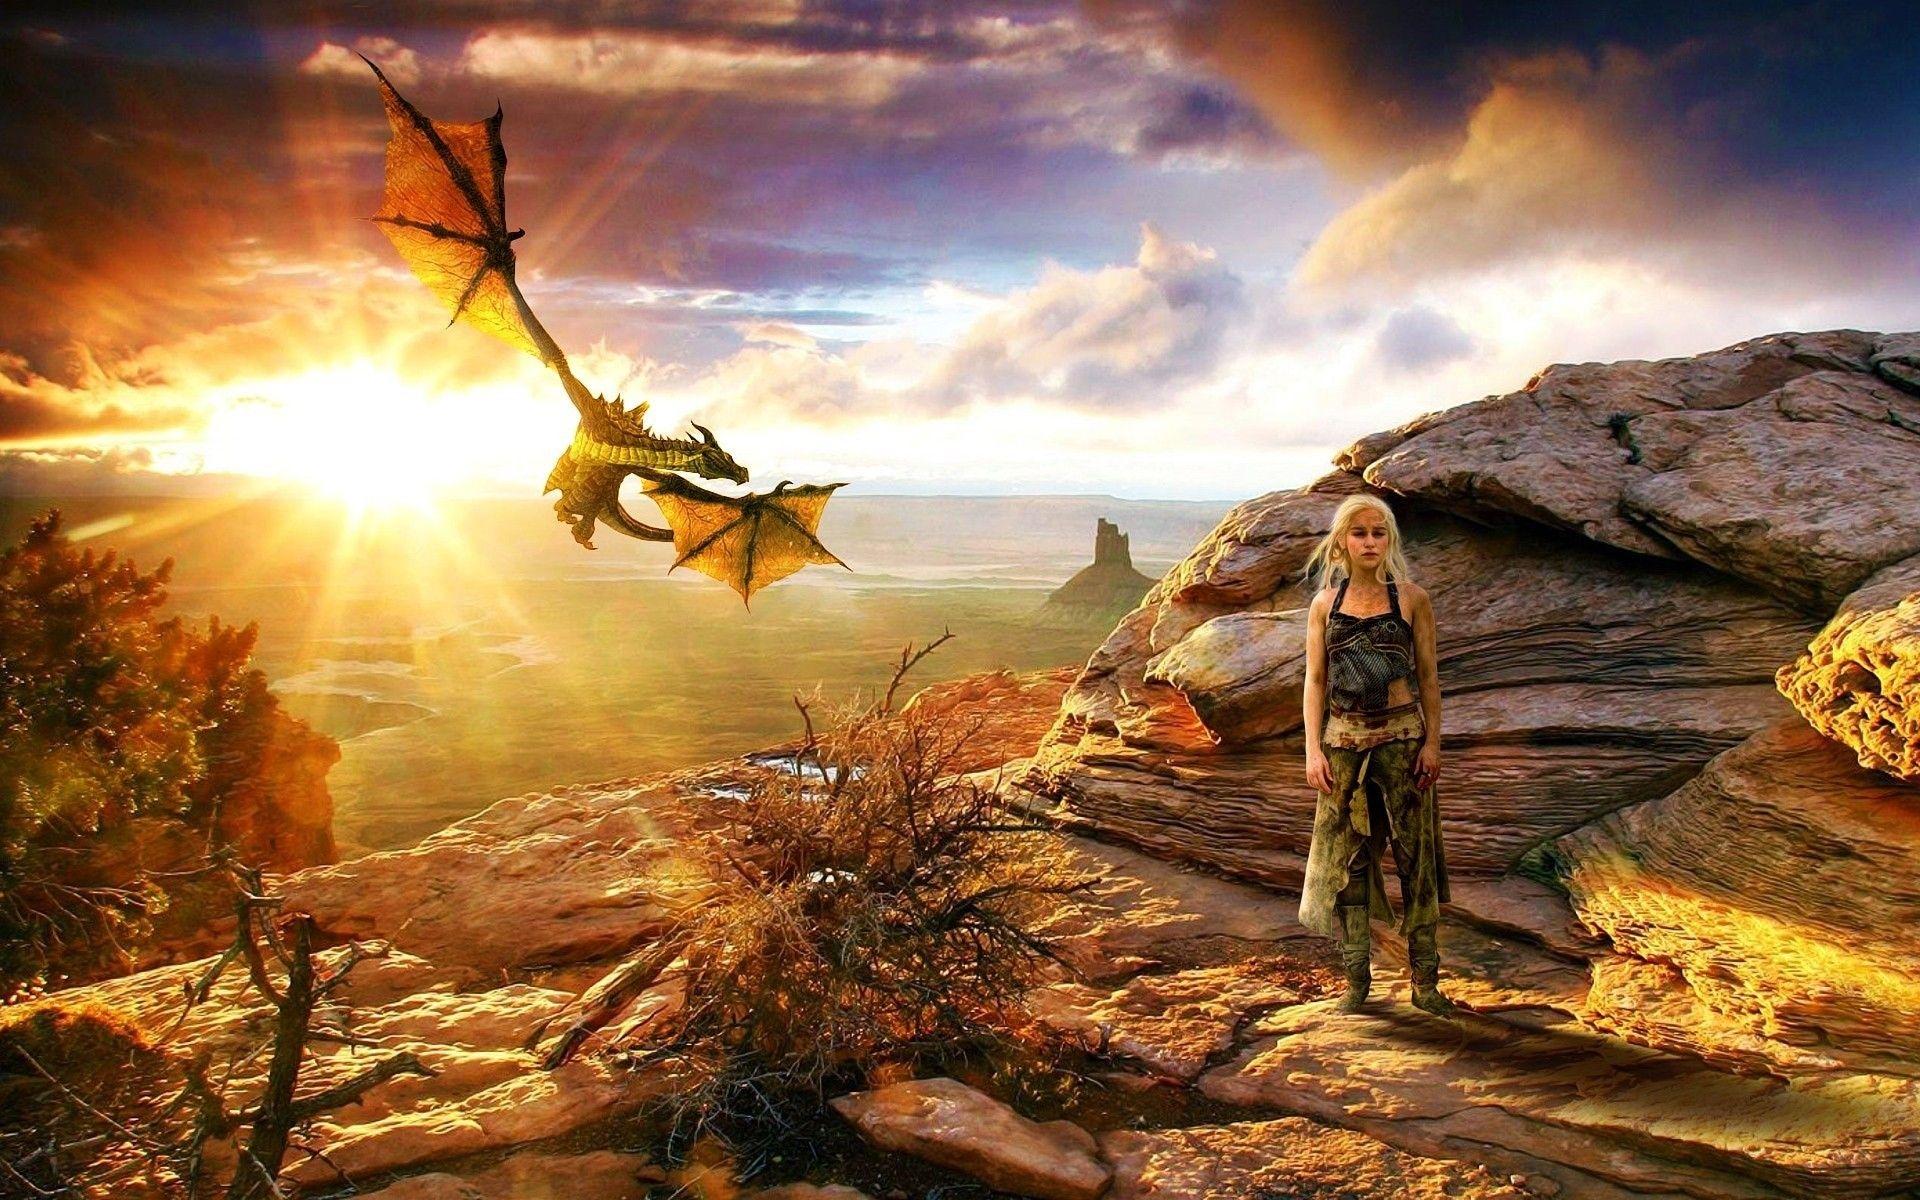 Game of Thrones landscape wallpaper